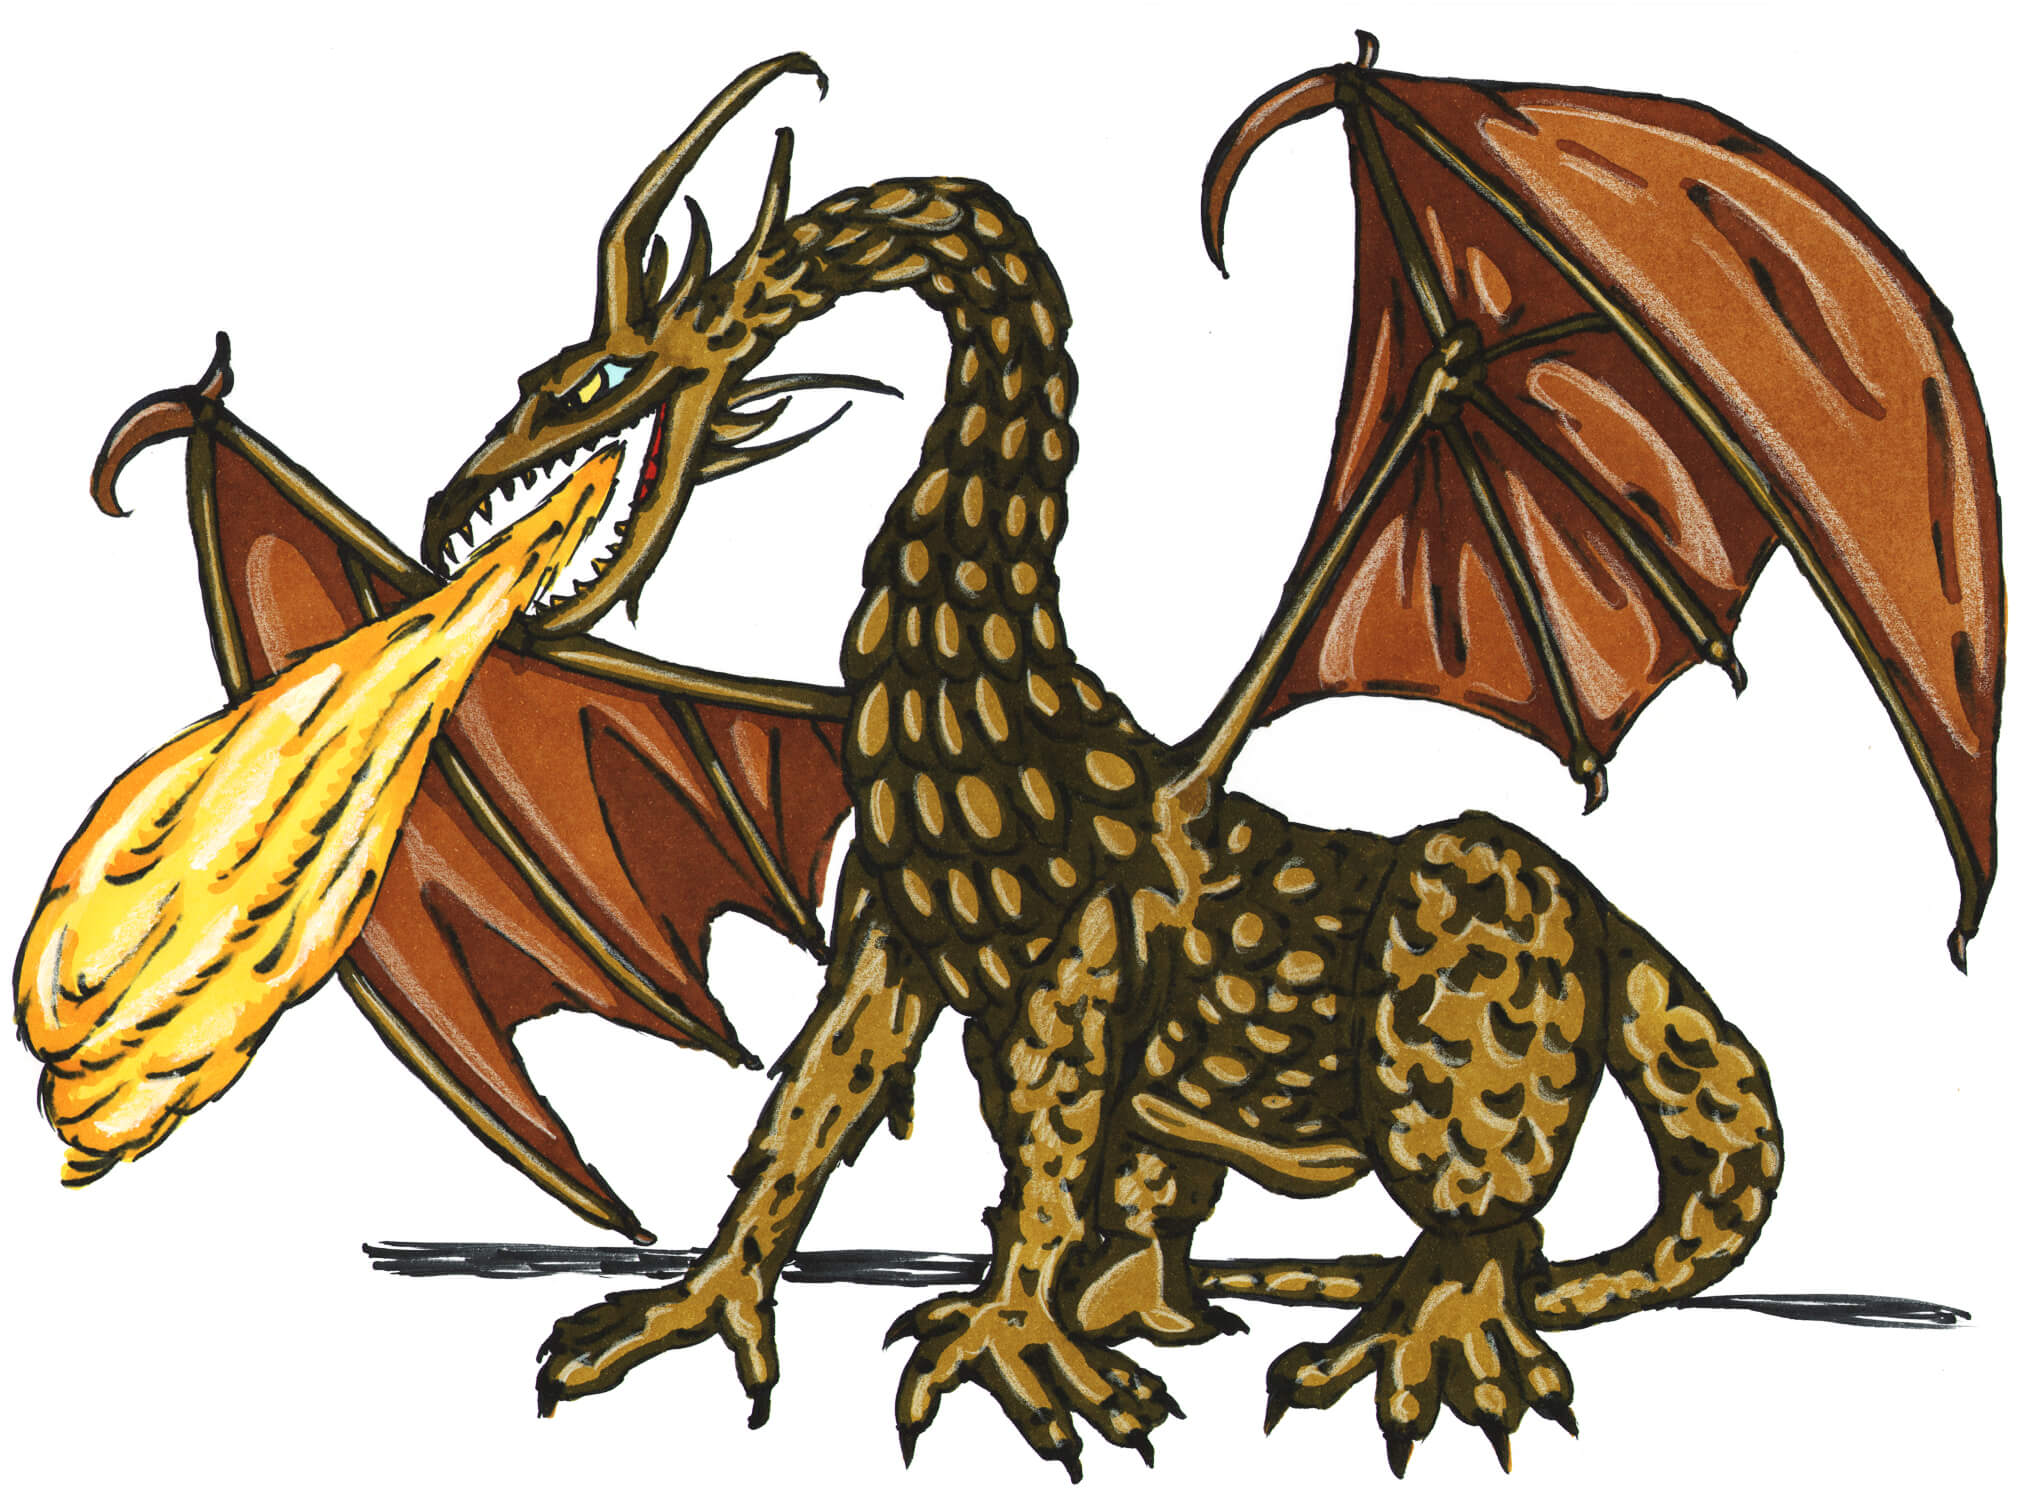 Xenosaurus Illustrations, Royalty-Free Vector Graphics & Clip Art - iStock